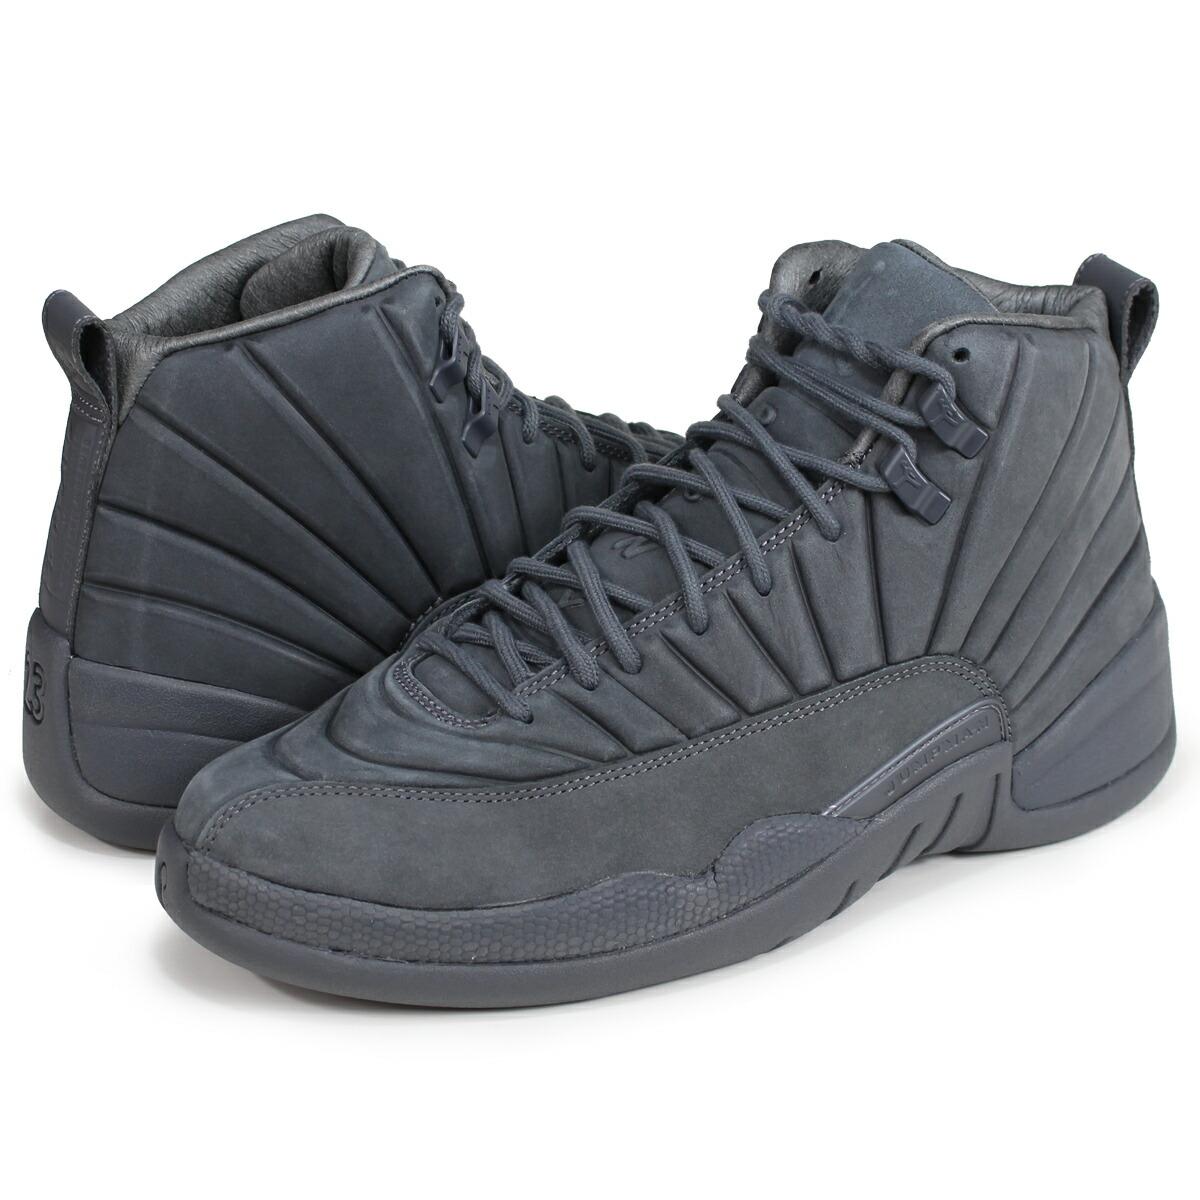 watch 31cf0 be7bc NIKE AIR JORDAN 12 RETRO PSNY Nike Air Jordan 12 nostalgic sneakers  130,690-003 gray [187]